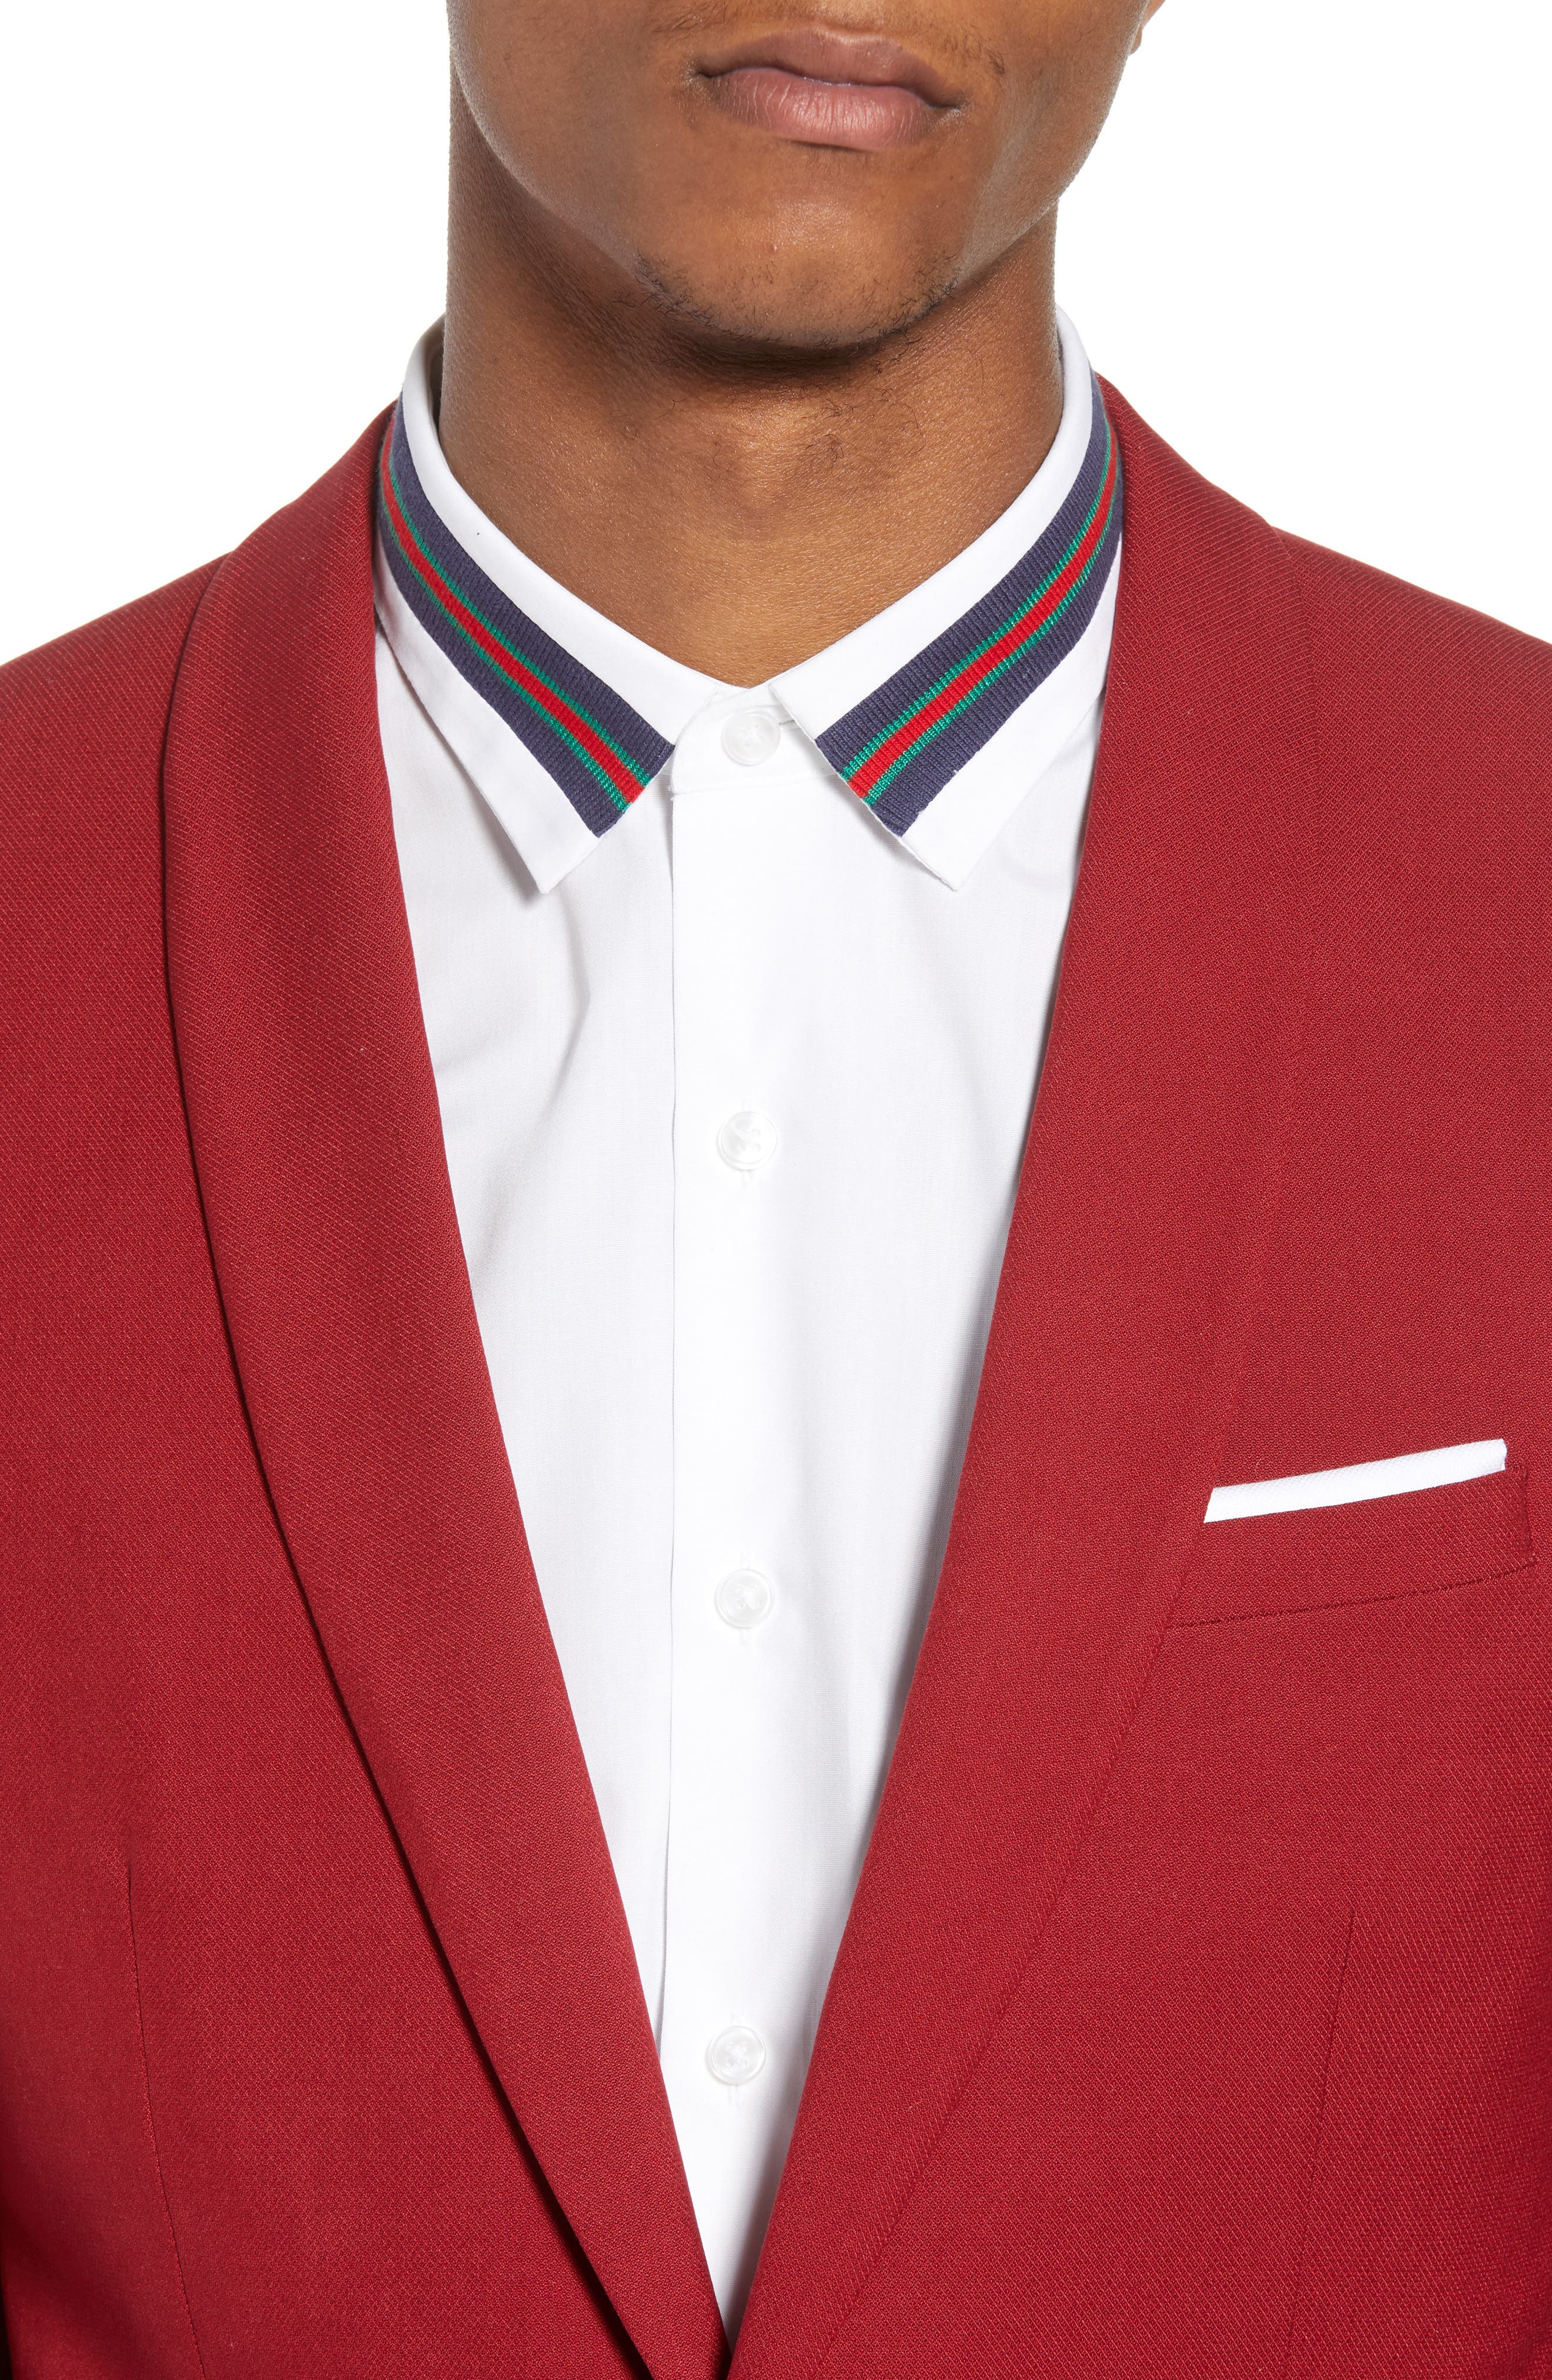 Skinny Fit Suit Jacket,                             Alternate thumbnail 4, color,                             600